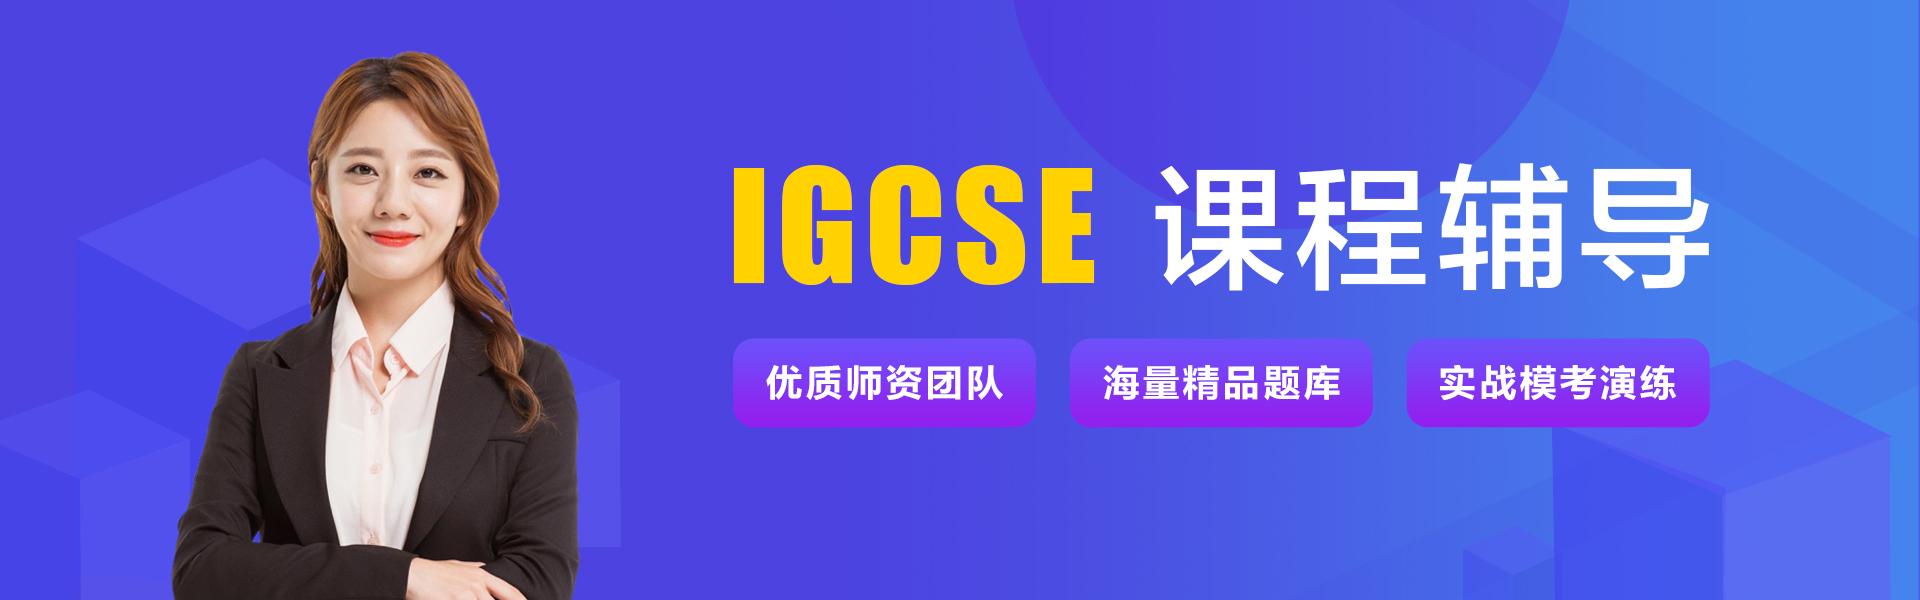 igcse课程辅导培训